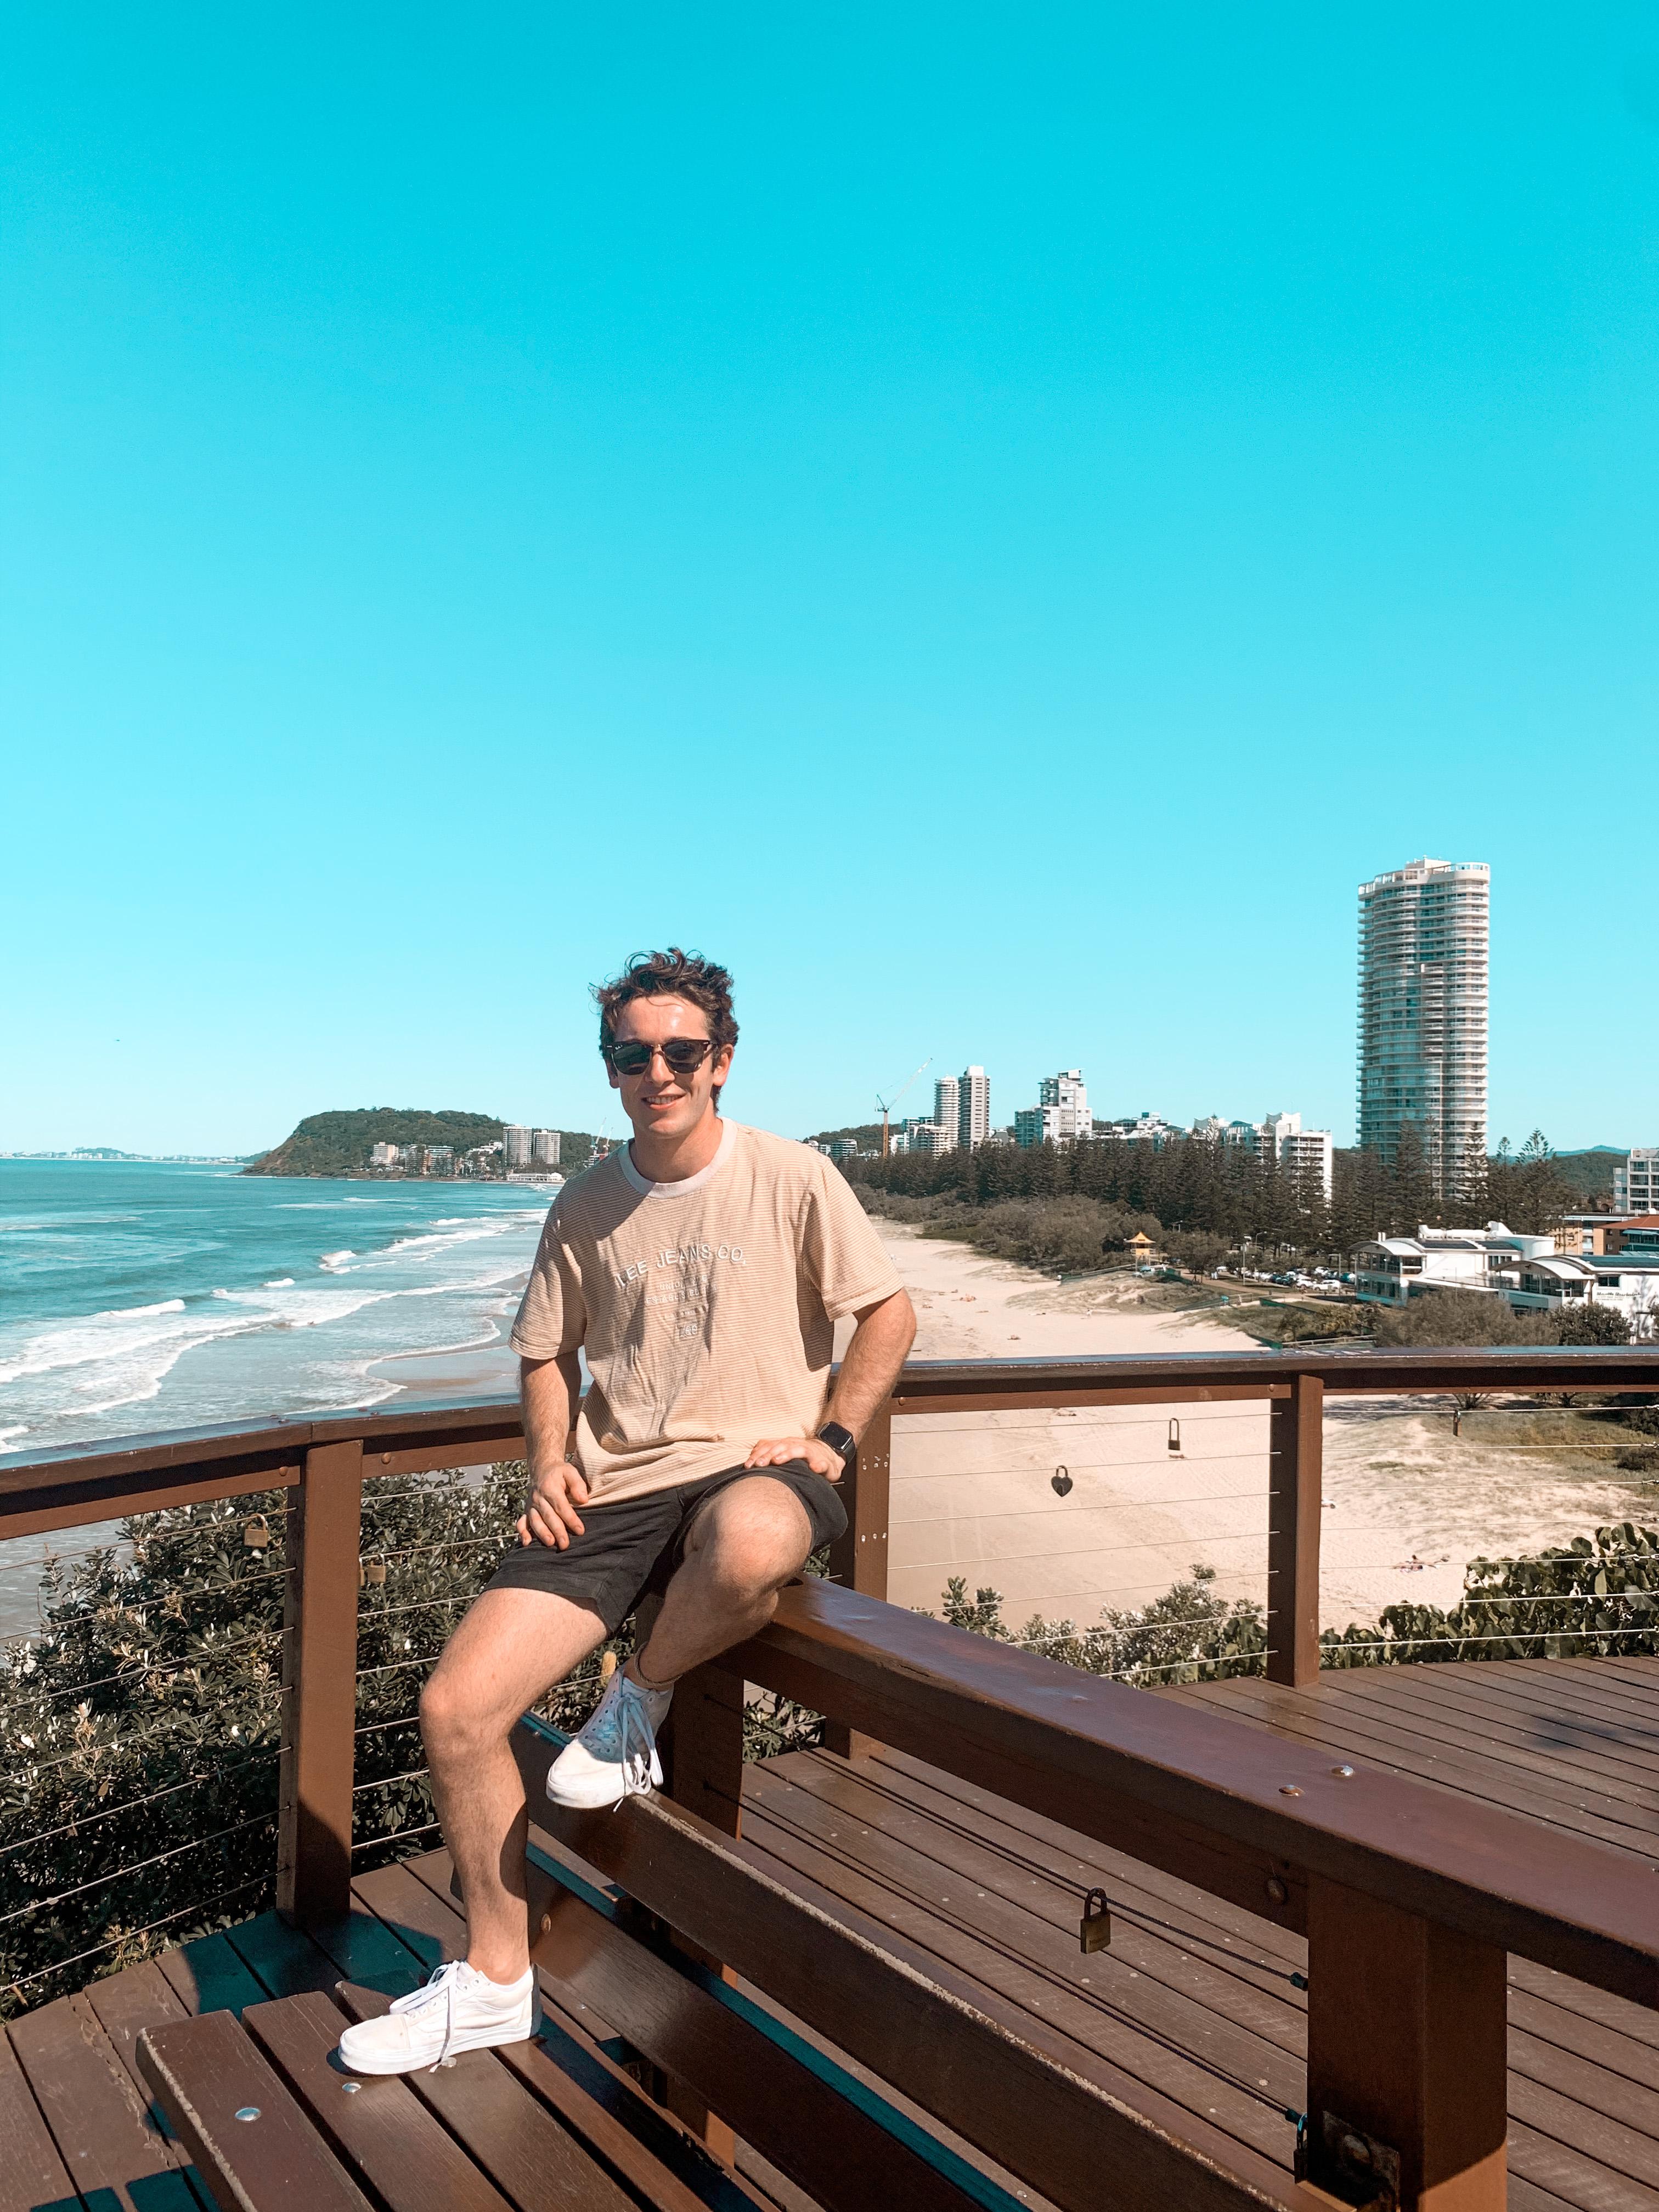 Australian Entrepreneur Dan Smith on how he became successful through Dropshipping